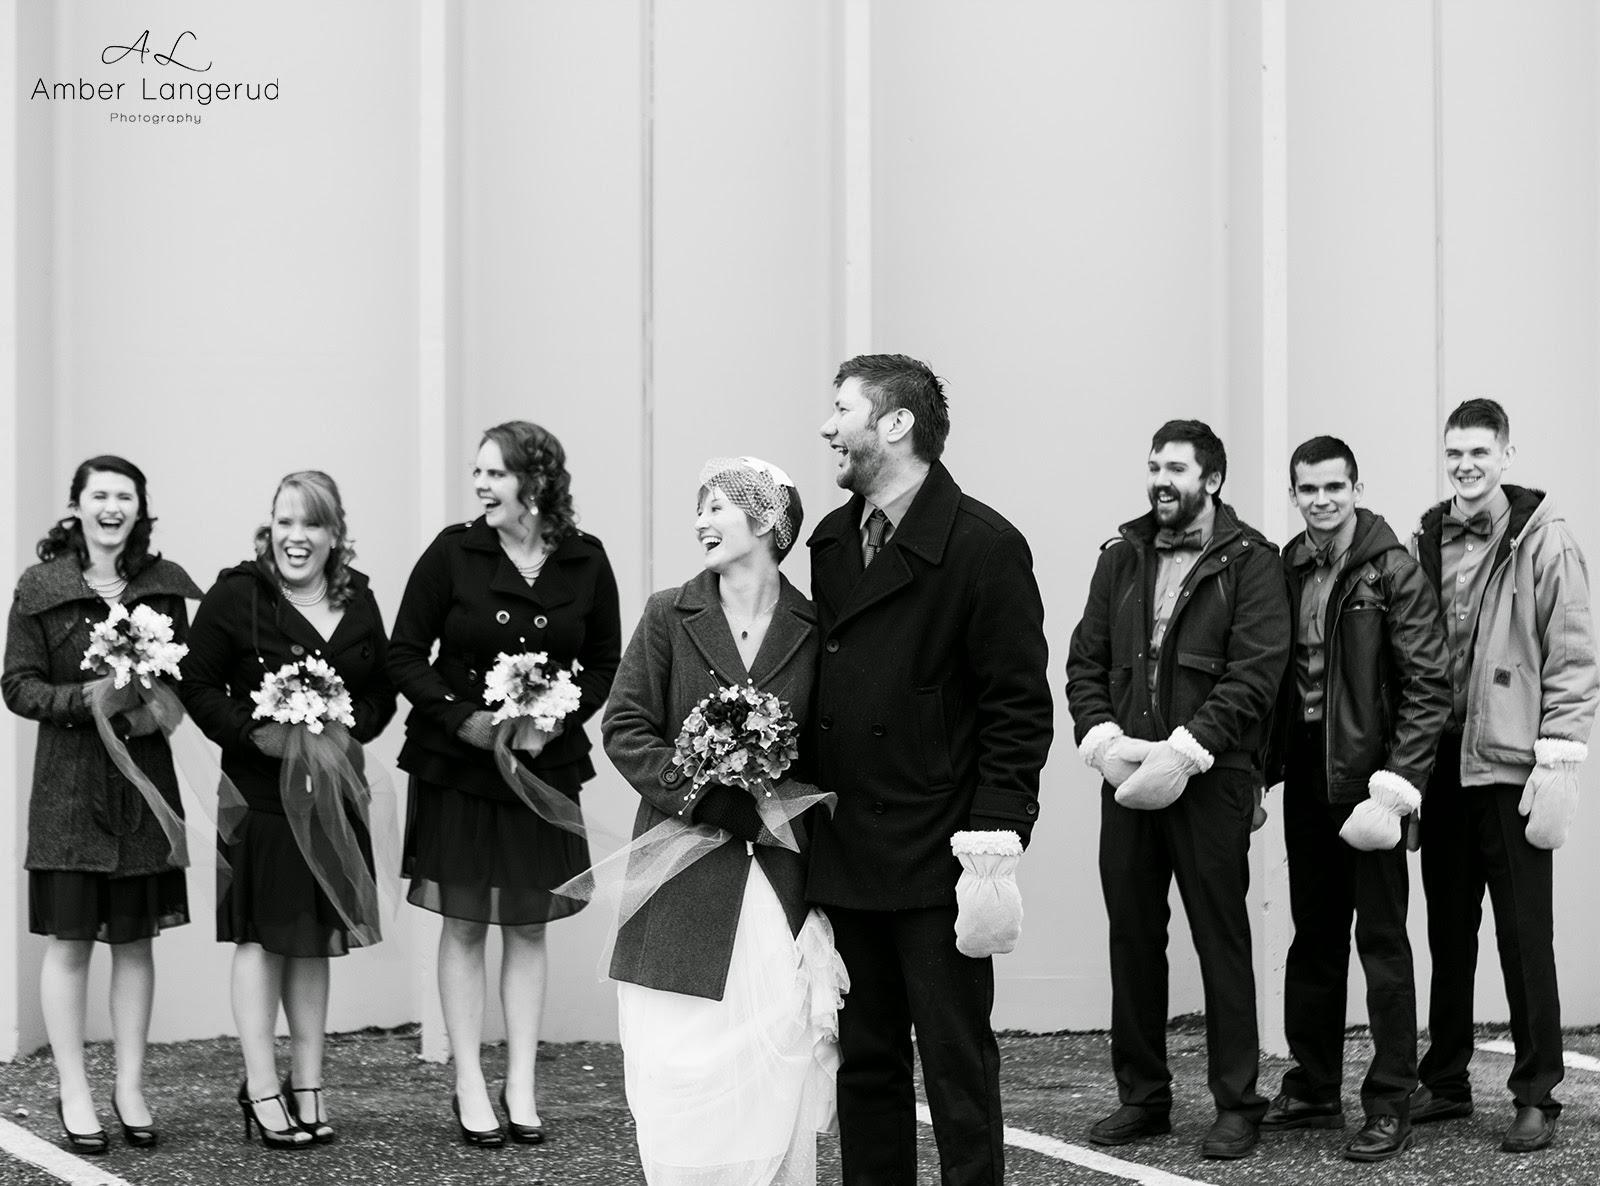 Grandforks/EastGrandForks Wedding   Detroit Lakes, Fargo/Moorhead Wedding Photographer   Winter Wedding